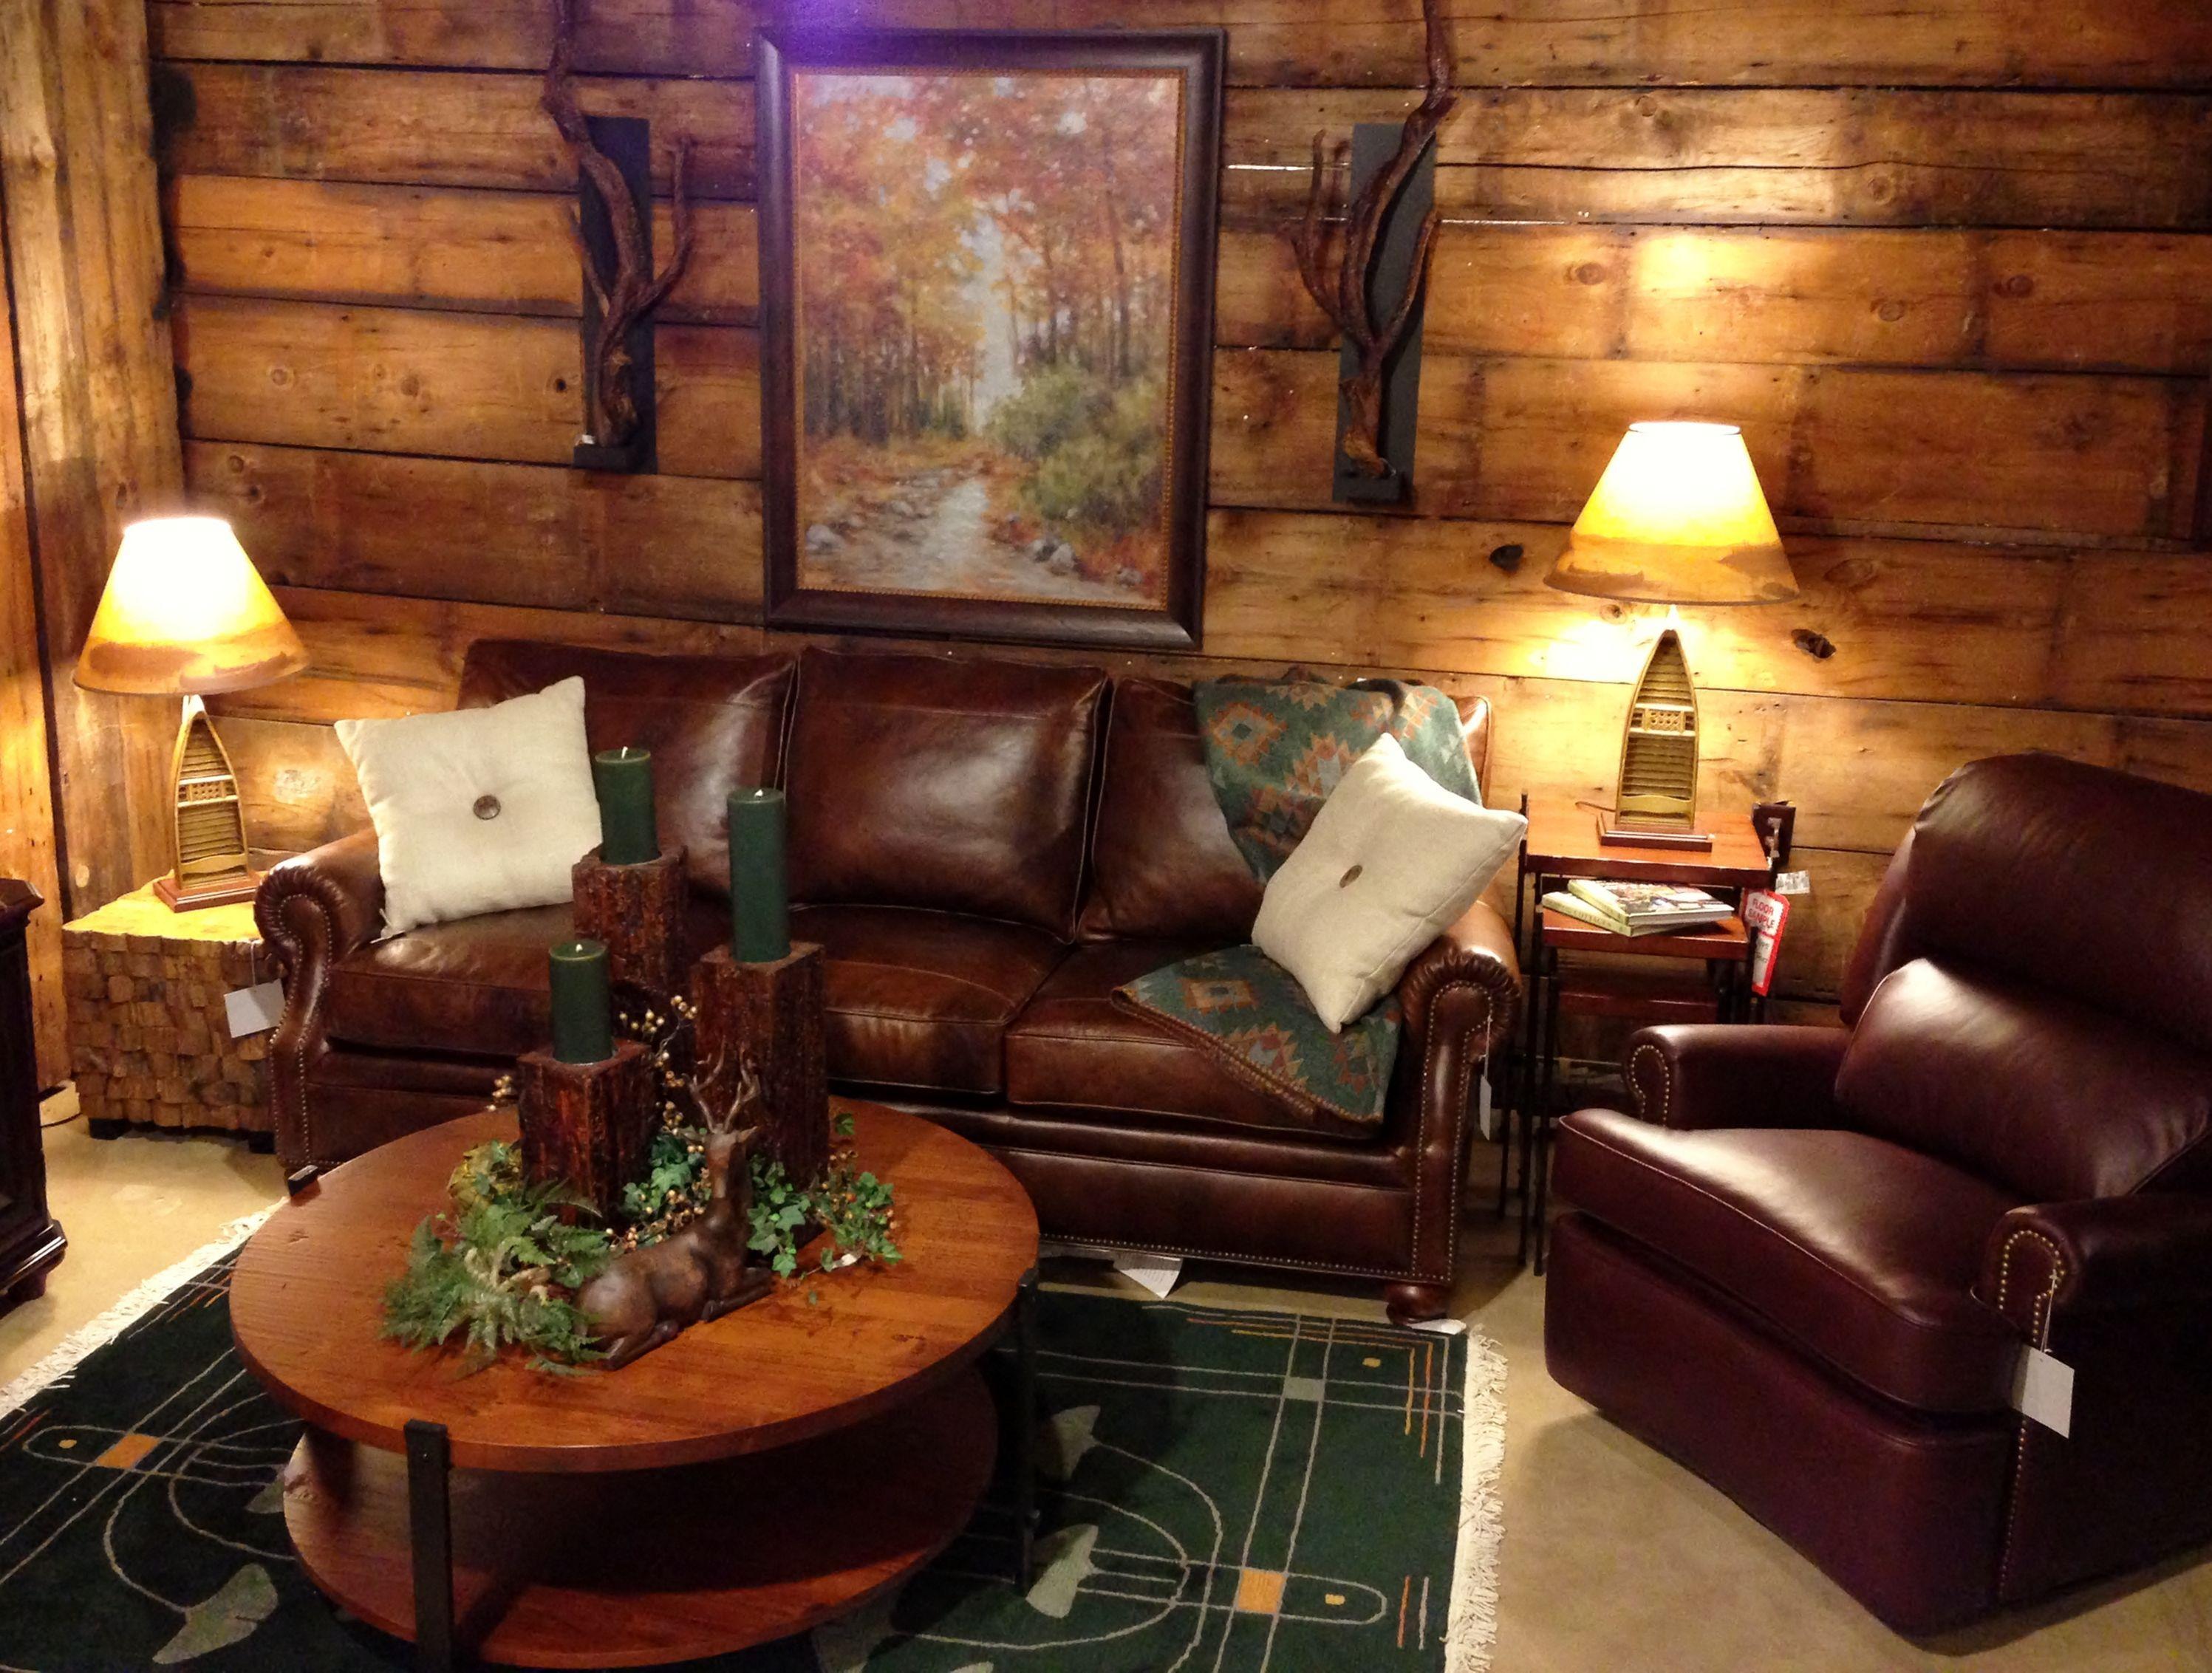 35 Most Unique Rustic Living Room Ideas Never Seen Before Dexorate Living Room Decor Rustic Rustic Living Room Rustic Living Room Furniture #rustic #living #room #lighting